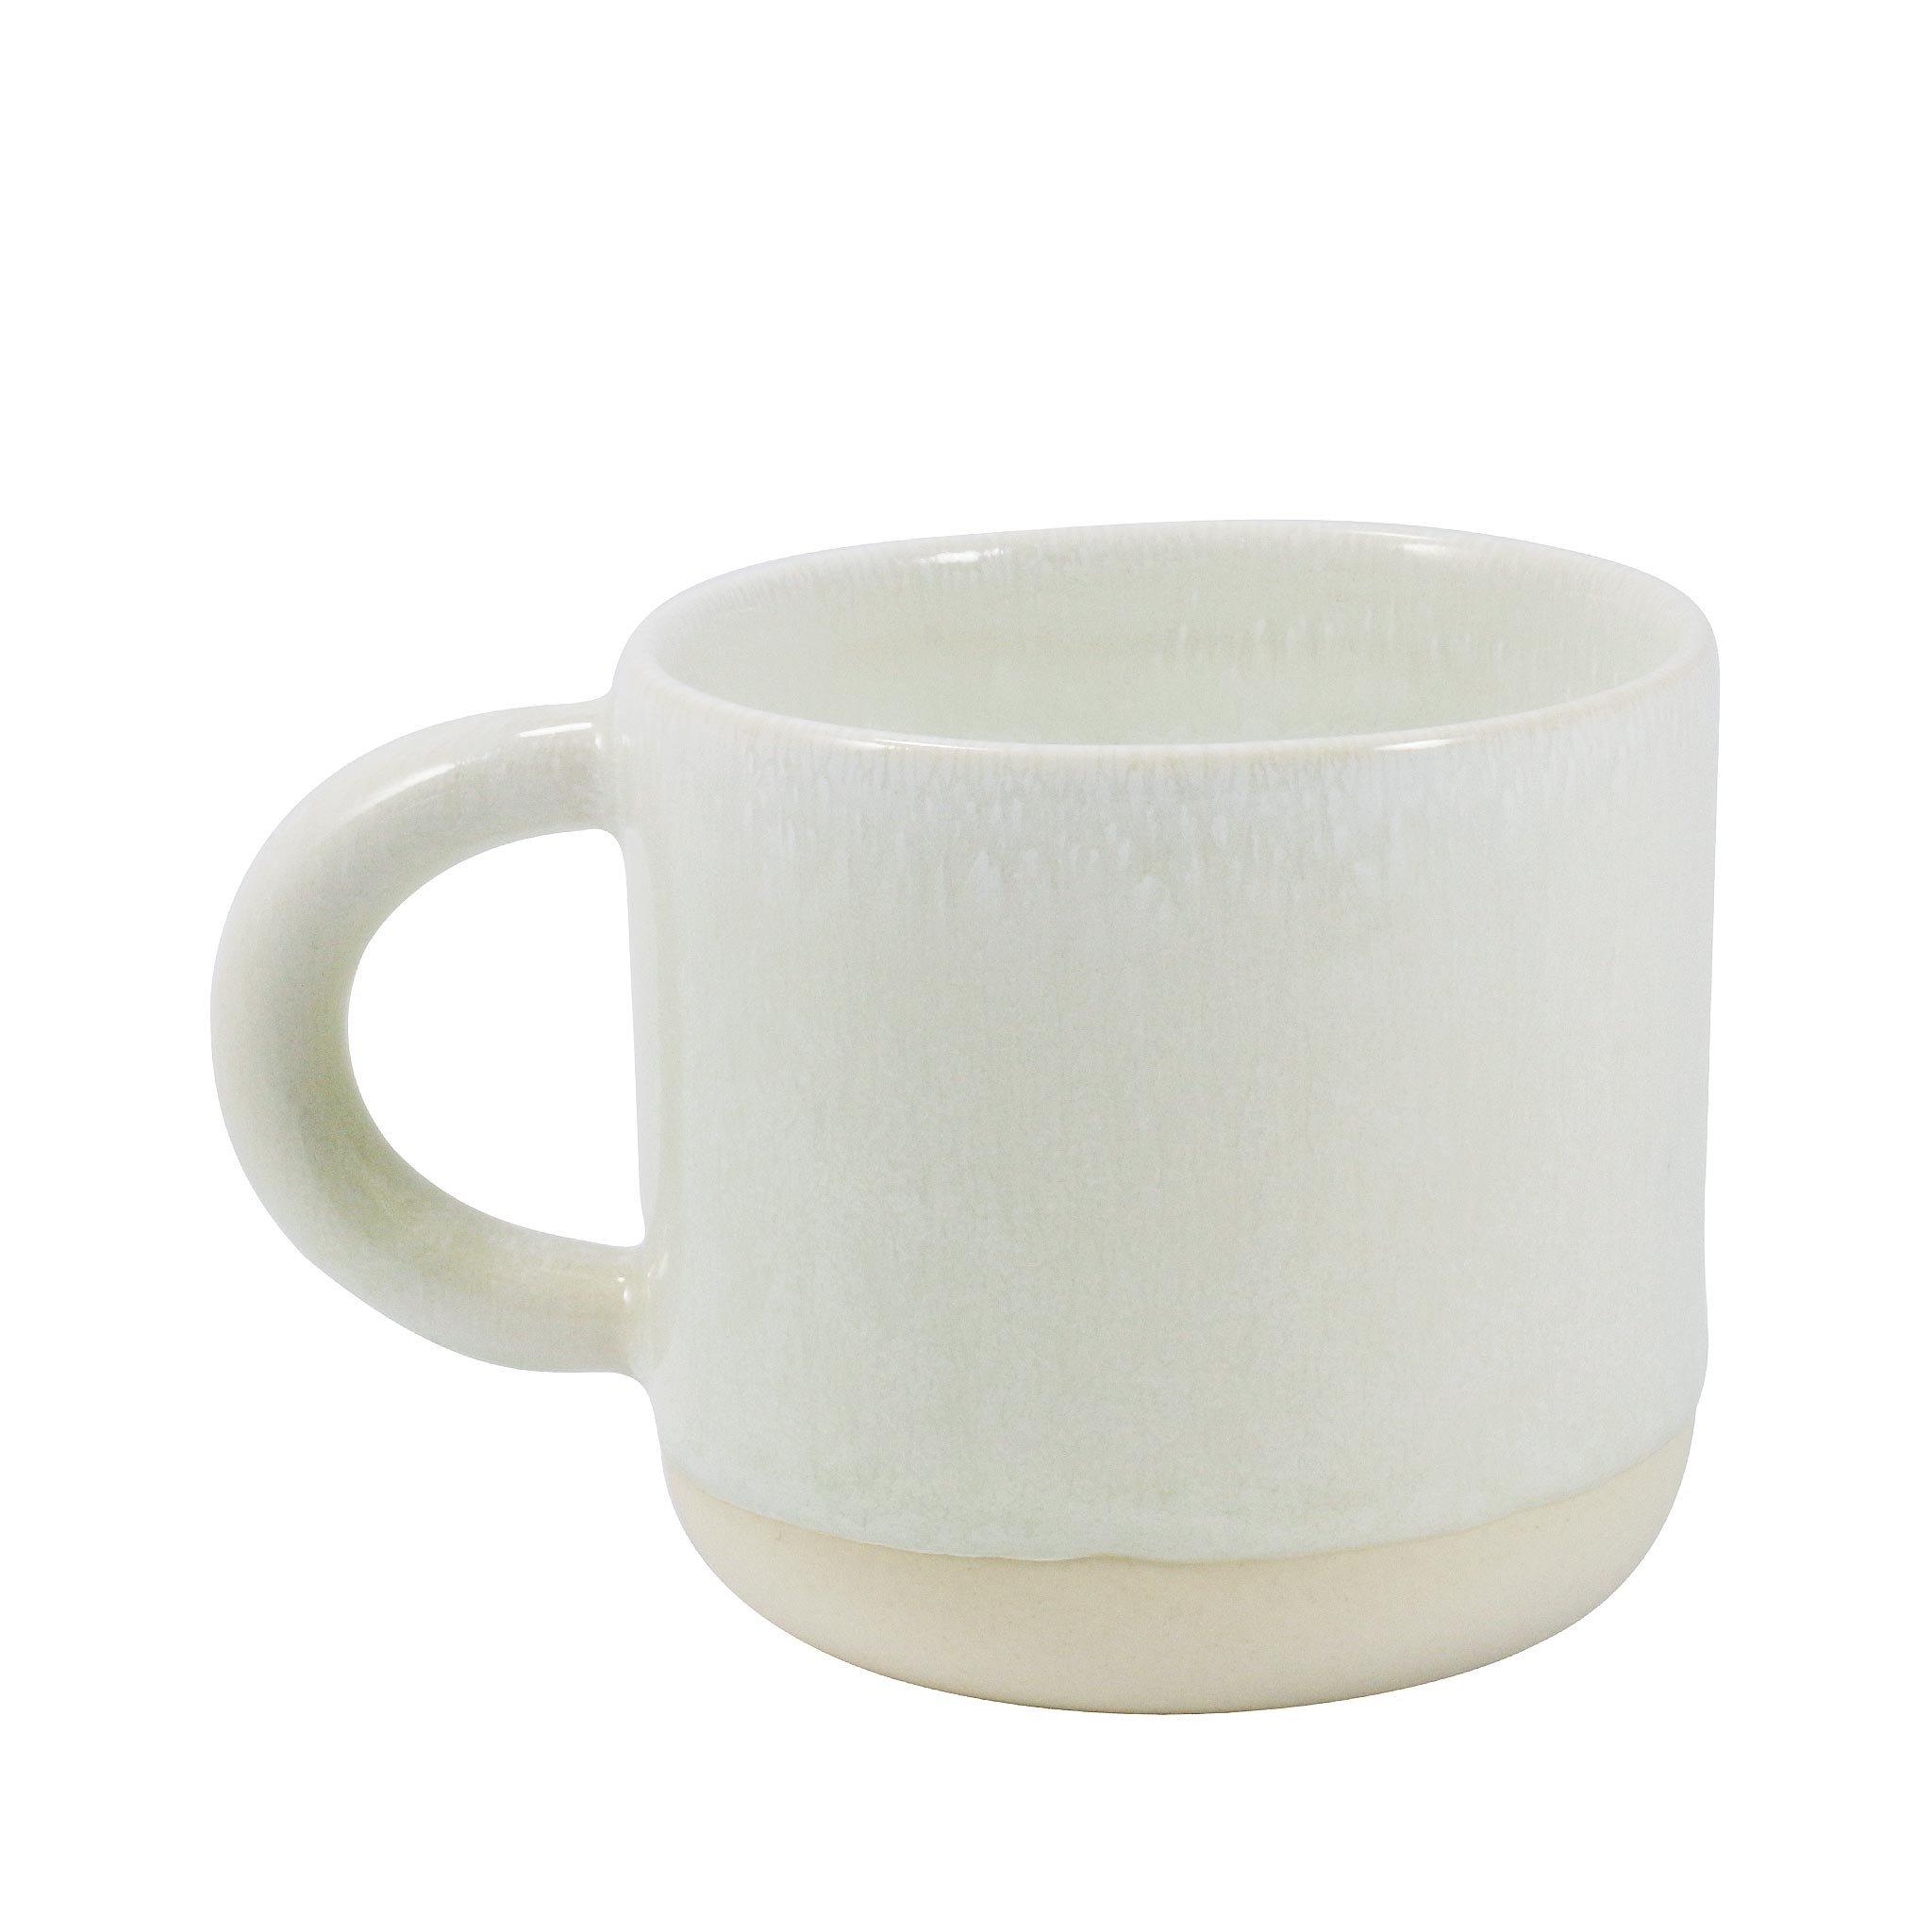 STUDIO ARHØJ - Chug Mug, Sea Foam